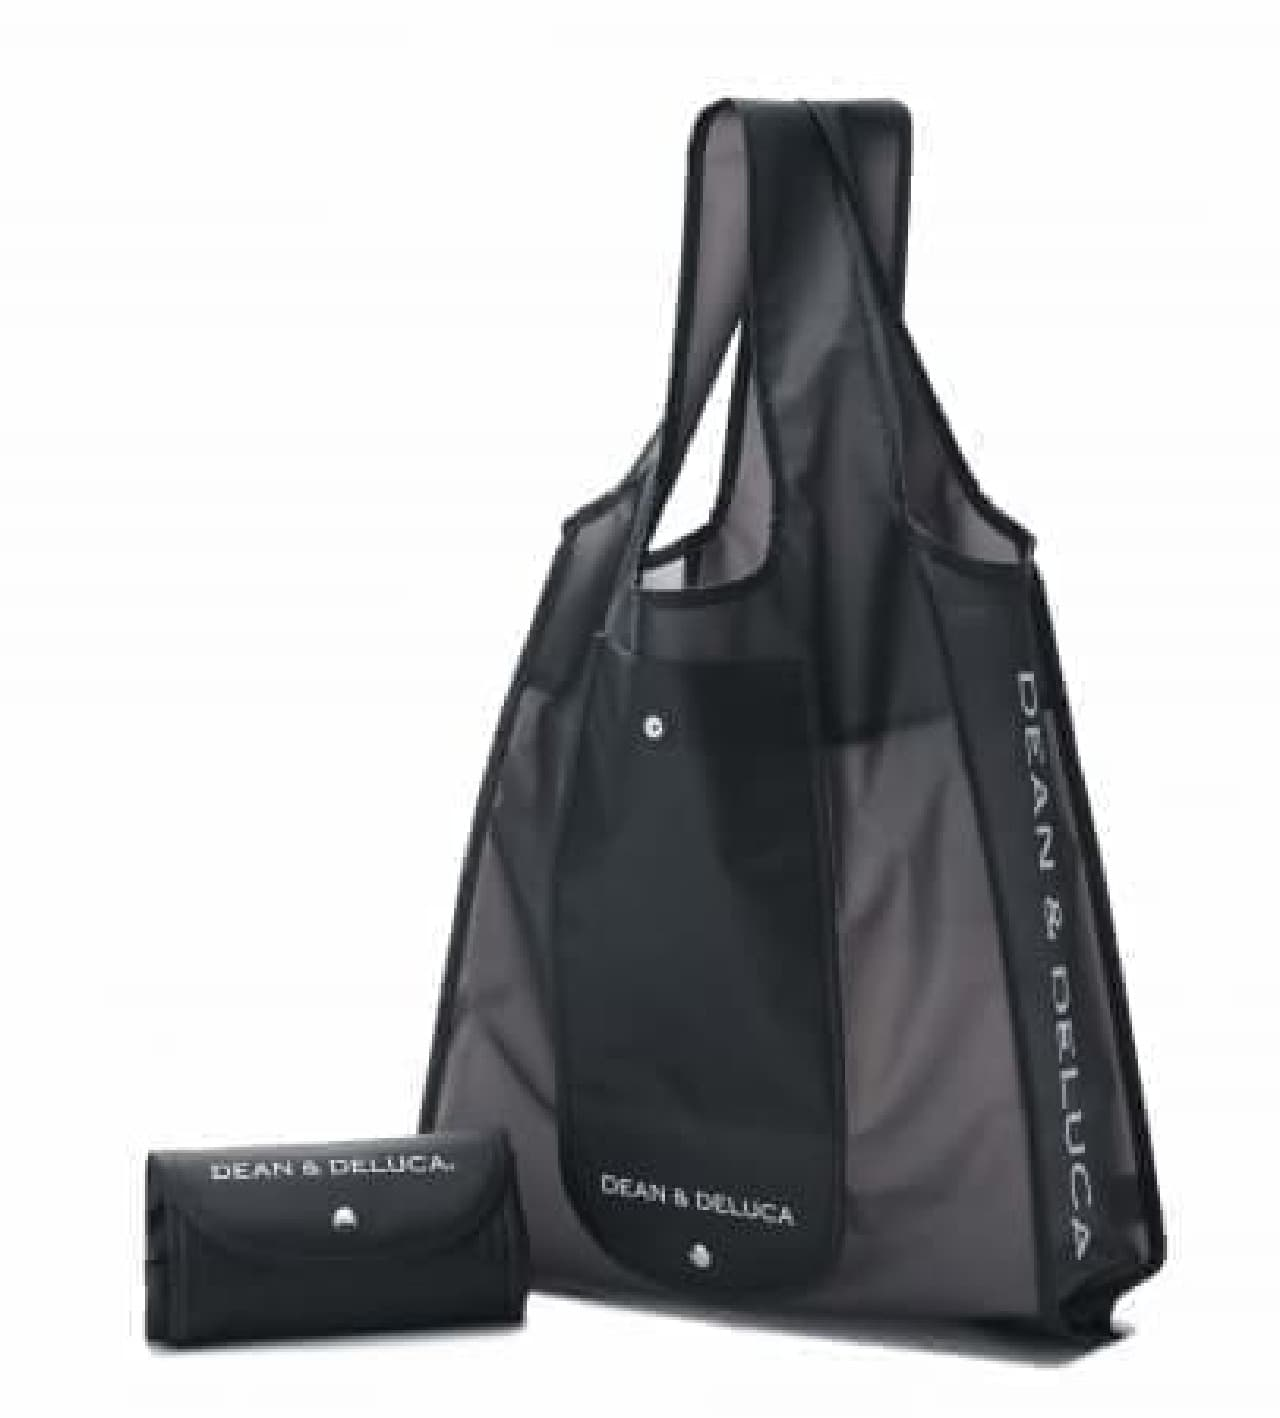 DEAN & DELUCA(ディーン&デルーカ)のミニマムエコバッグとショッピングバッグ クリアブラック